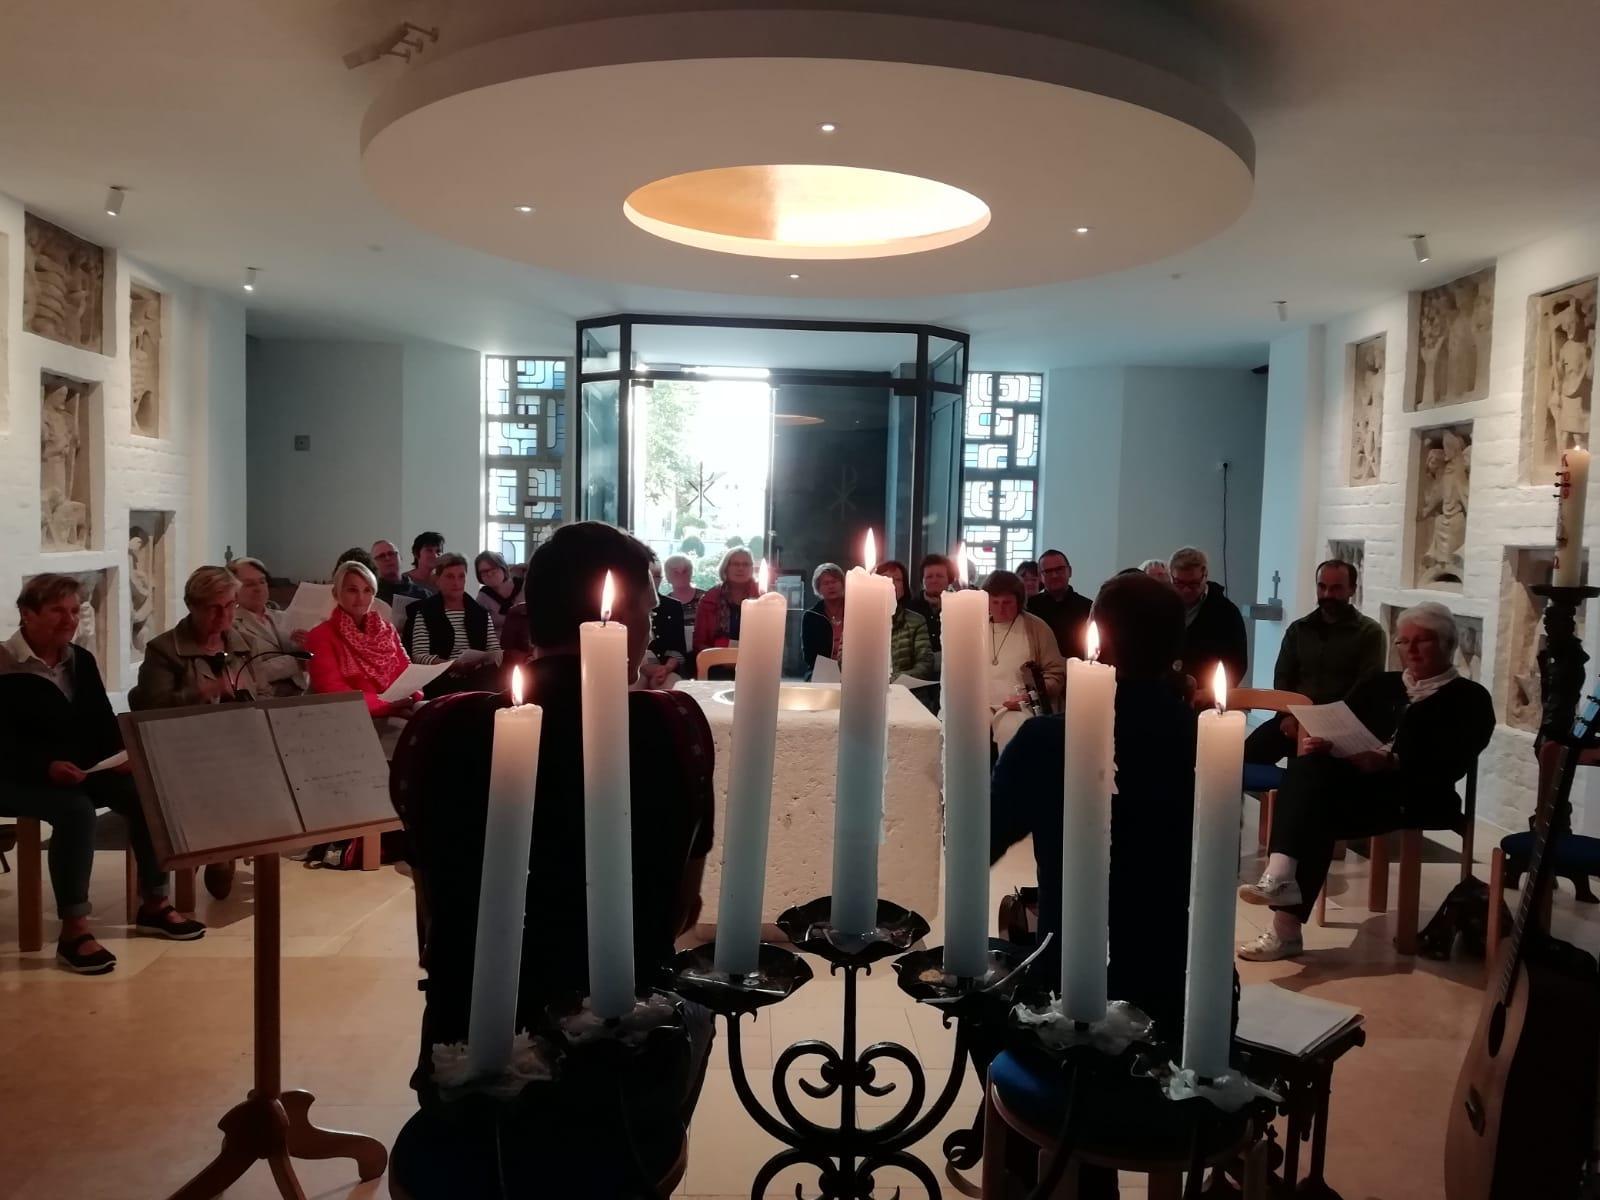 Pv offene kirche 3